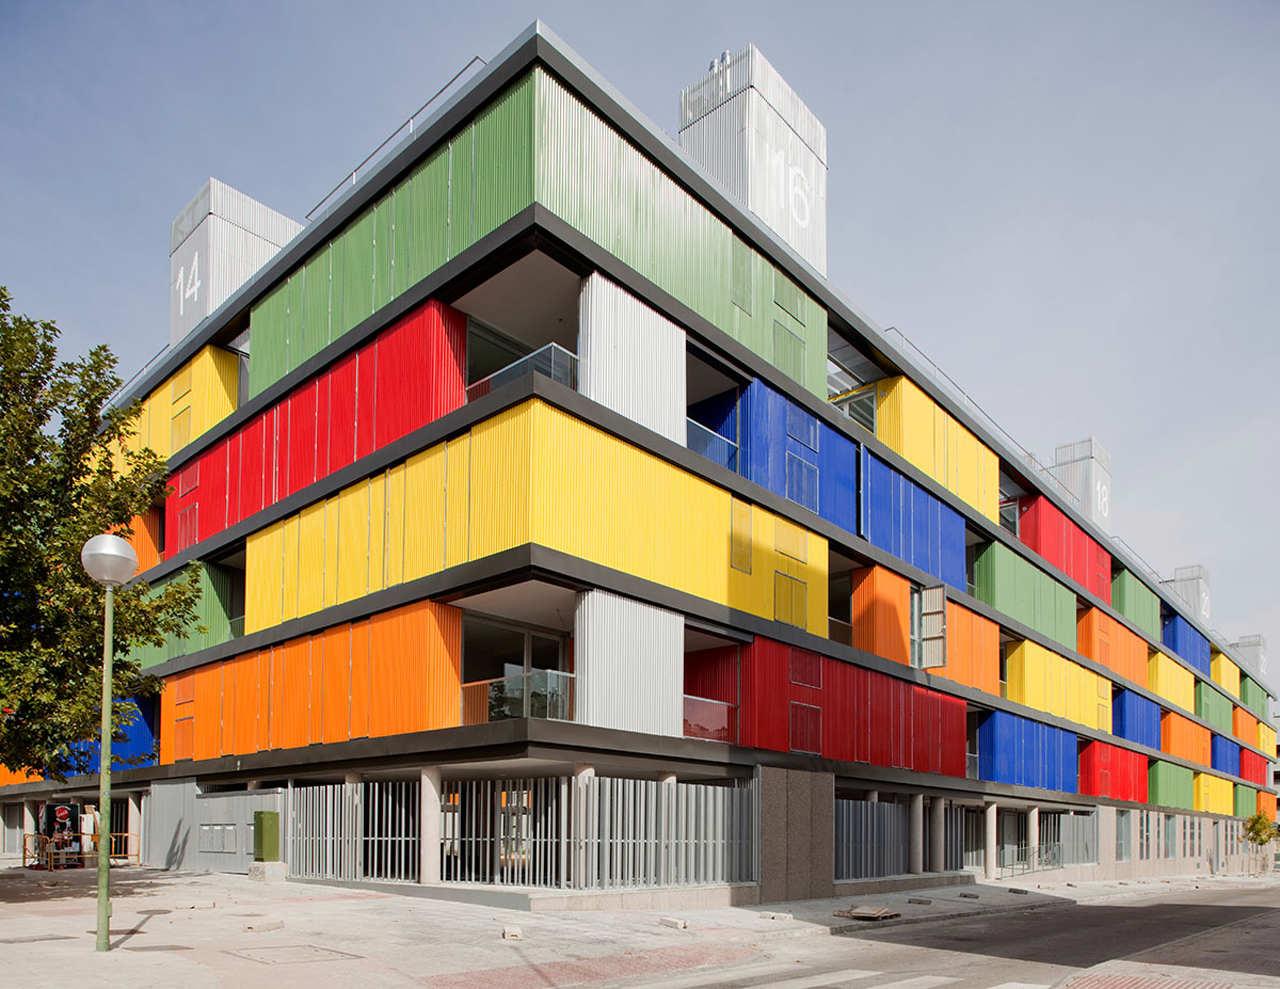 Edifício residencial em Carabanchel / Amann-Canovas-Maruri, © Miguel de Guzmán